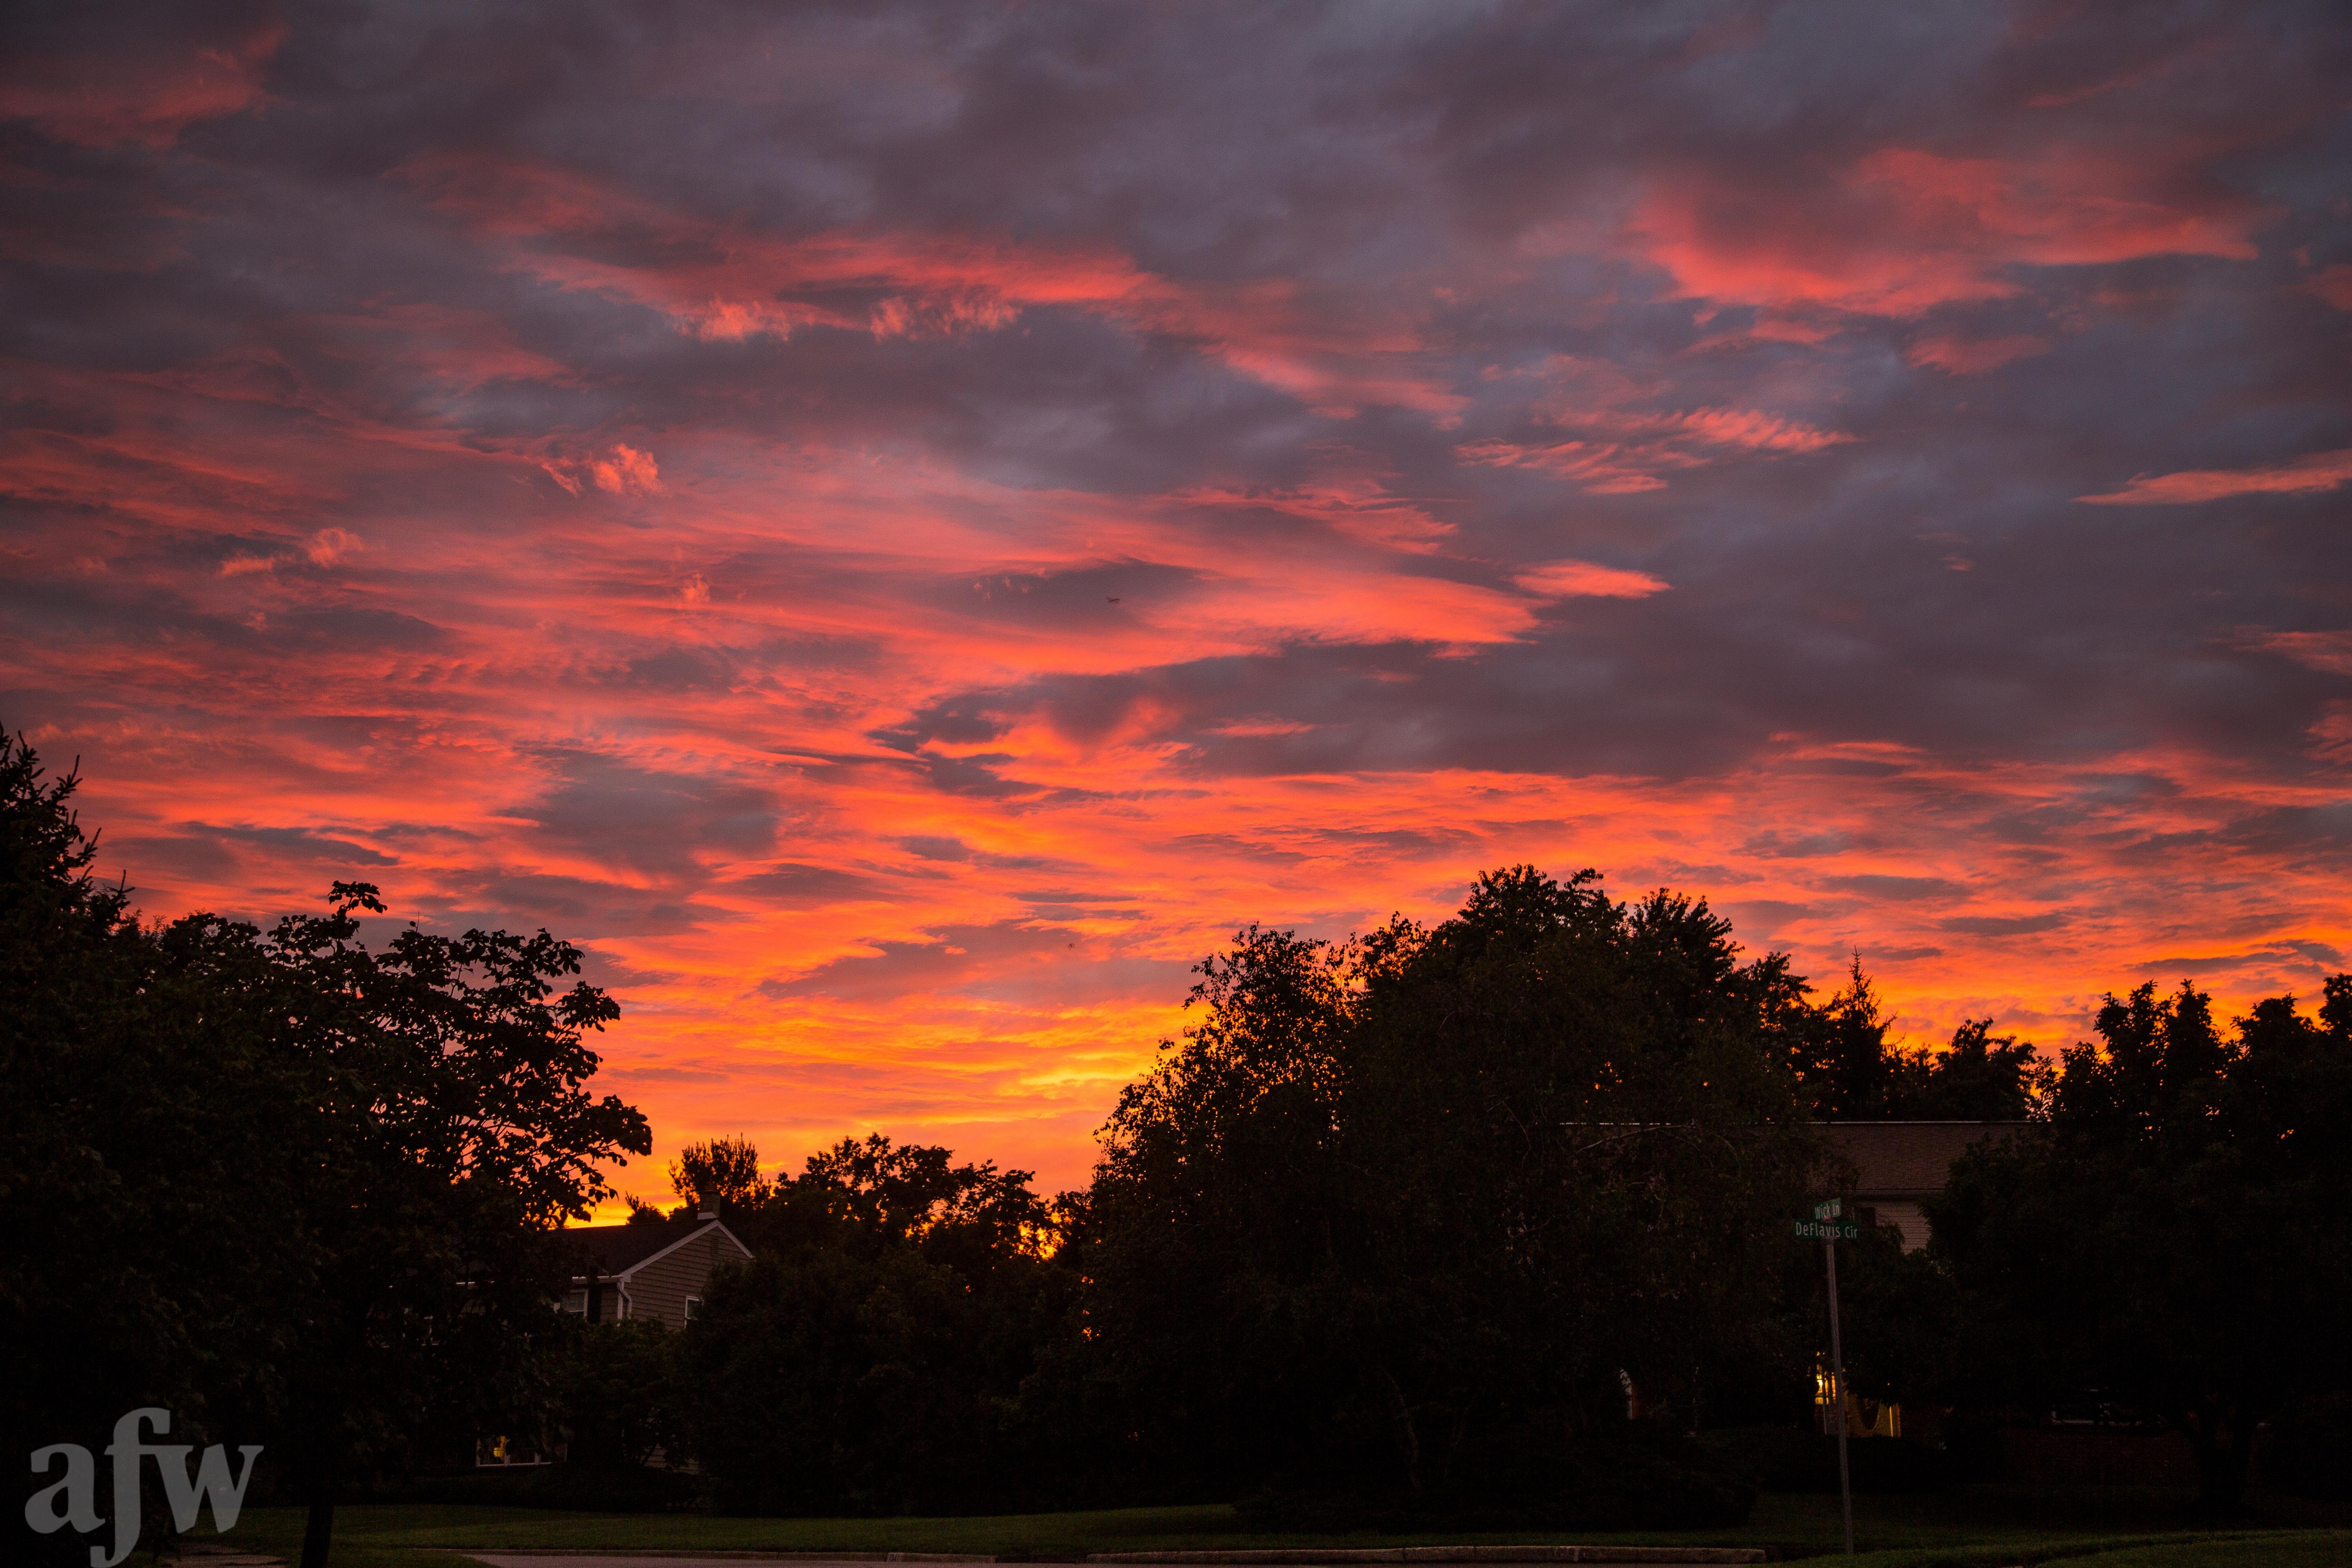 Evening Sky over Blue Bell